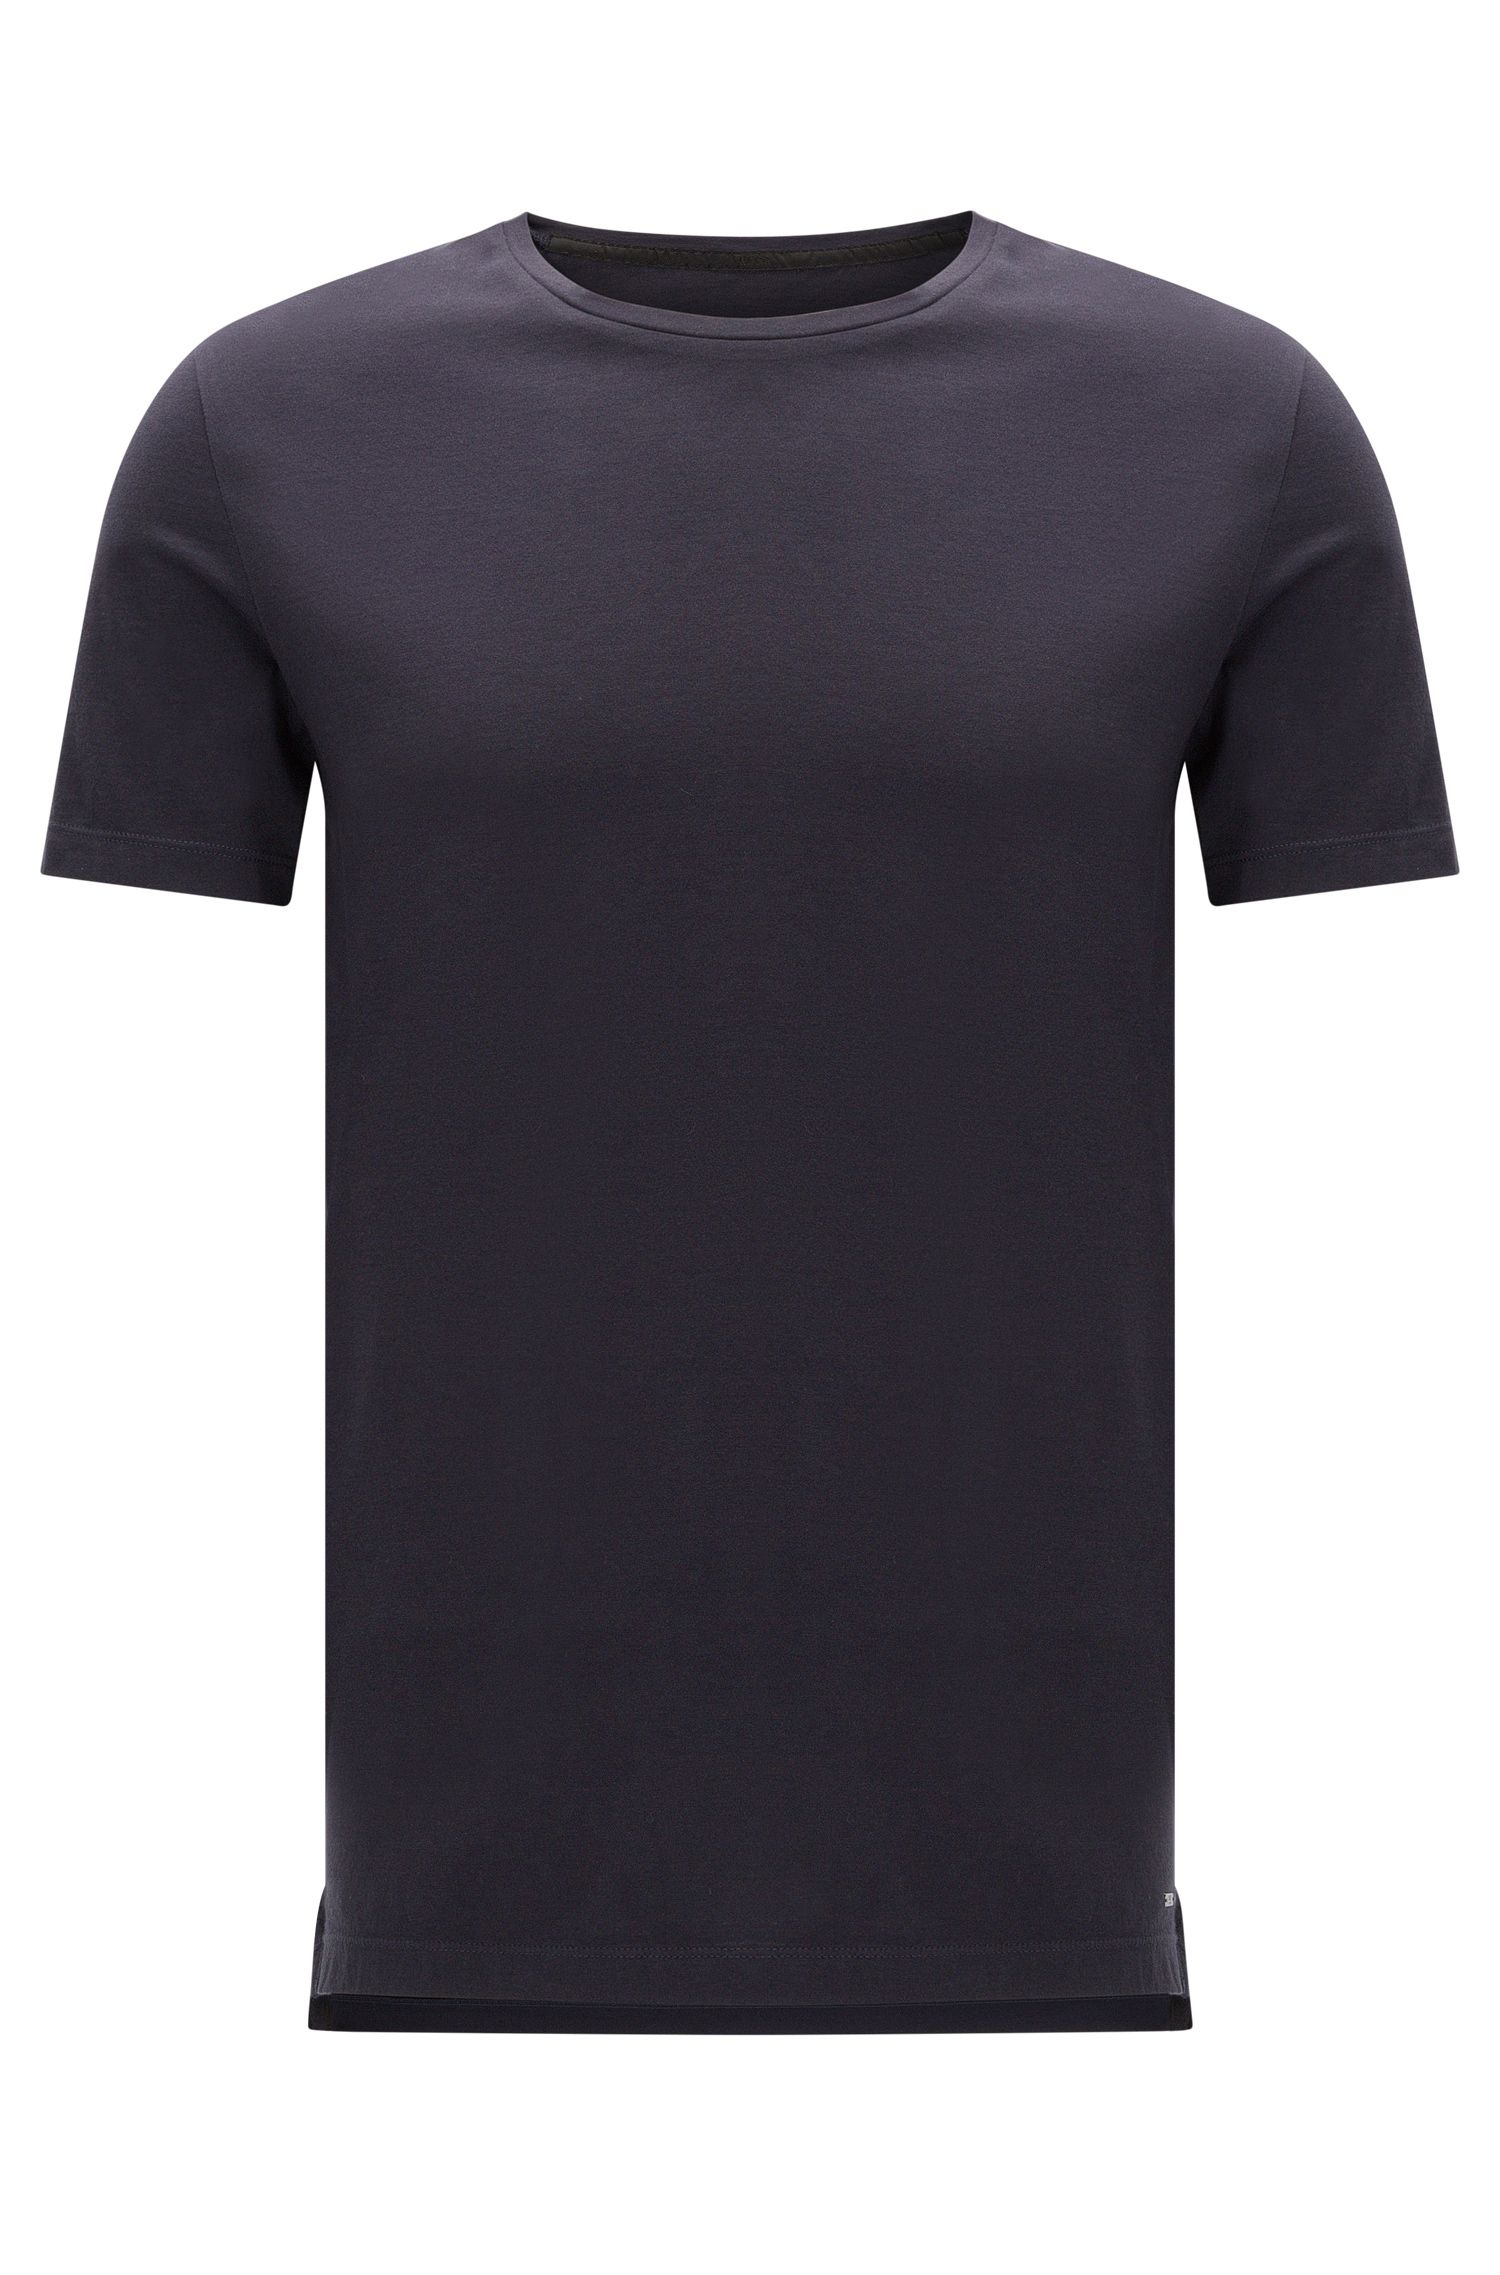 Cotton T-Shirt | Tessler WS